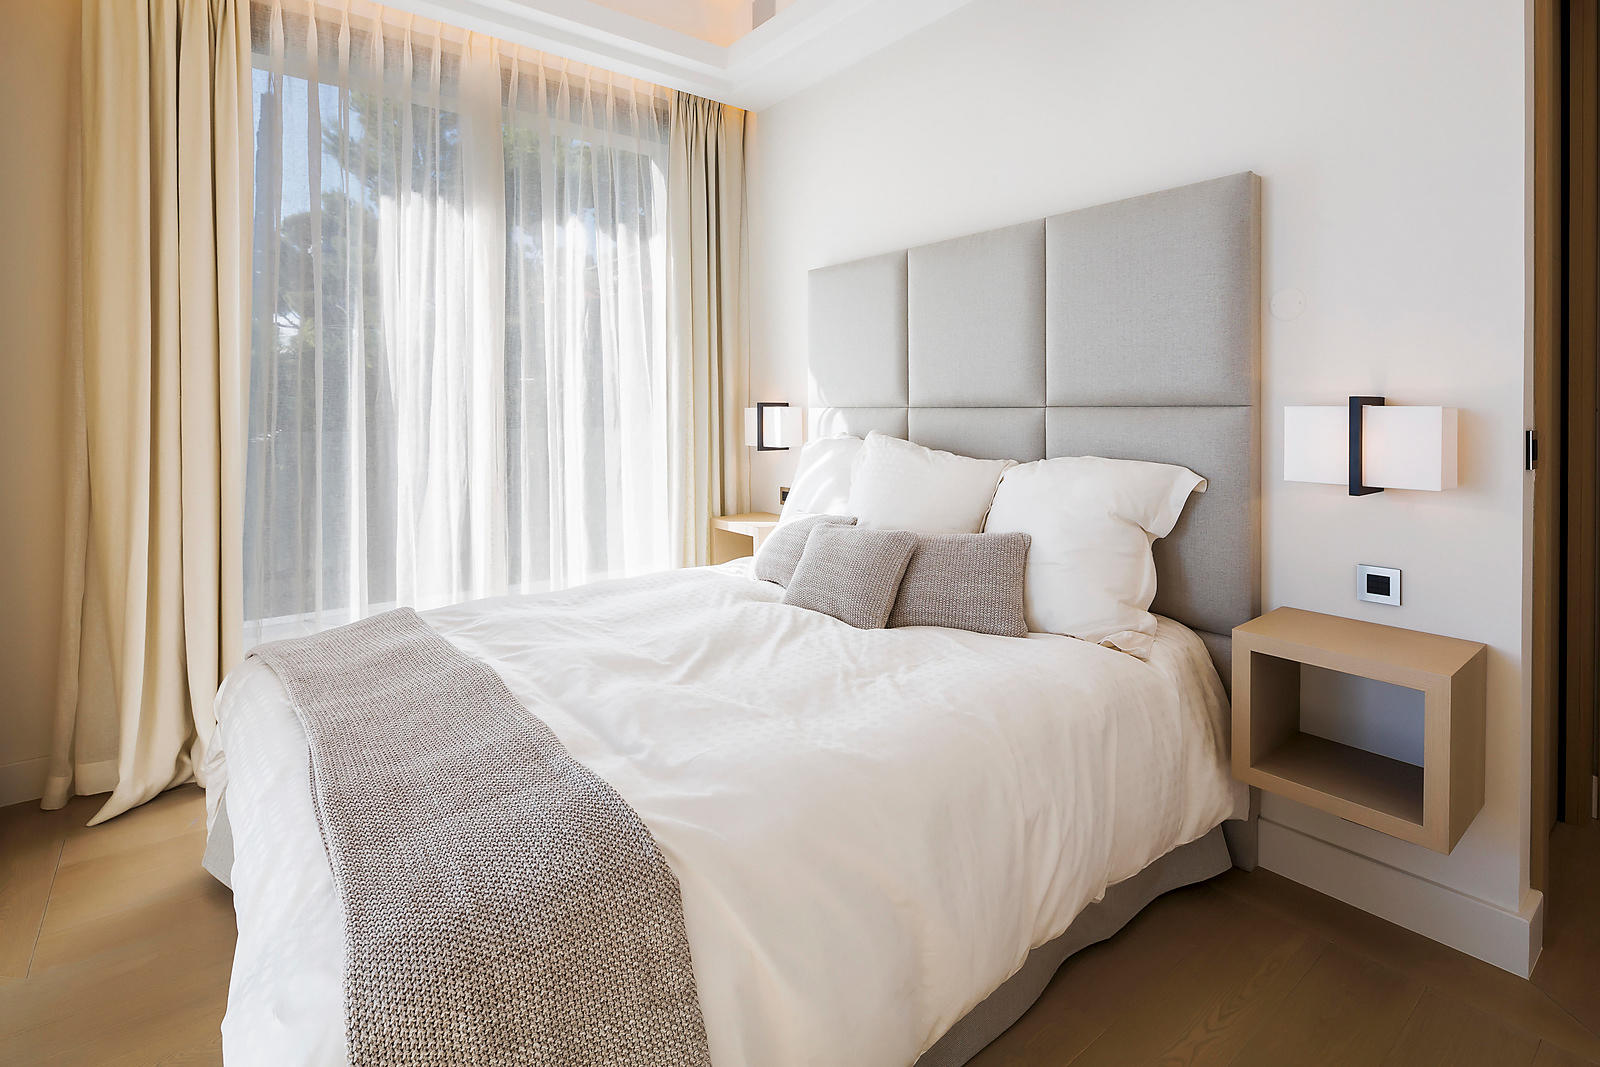 Chambre bedroom villa de luxe fren Riviera